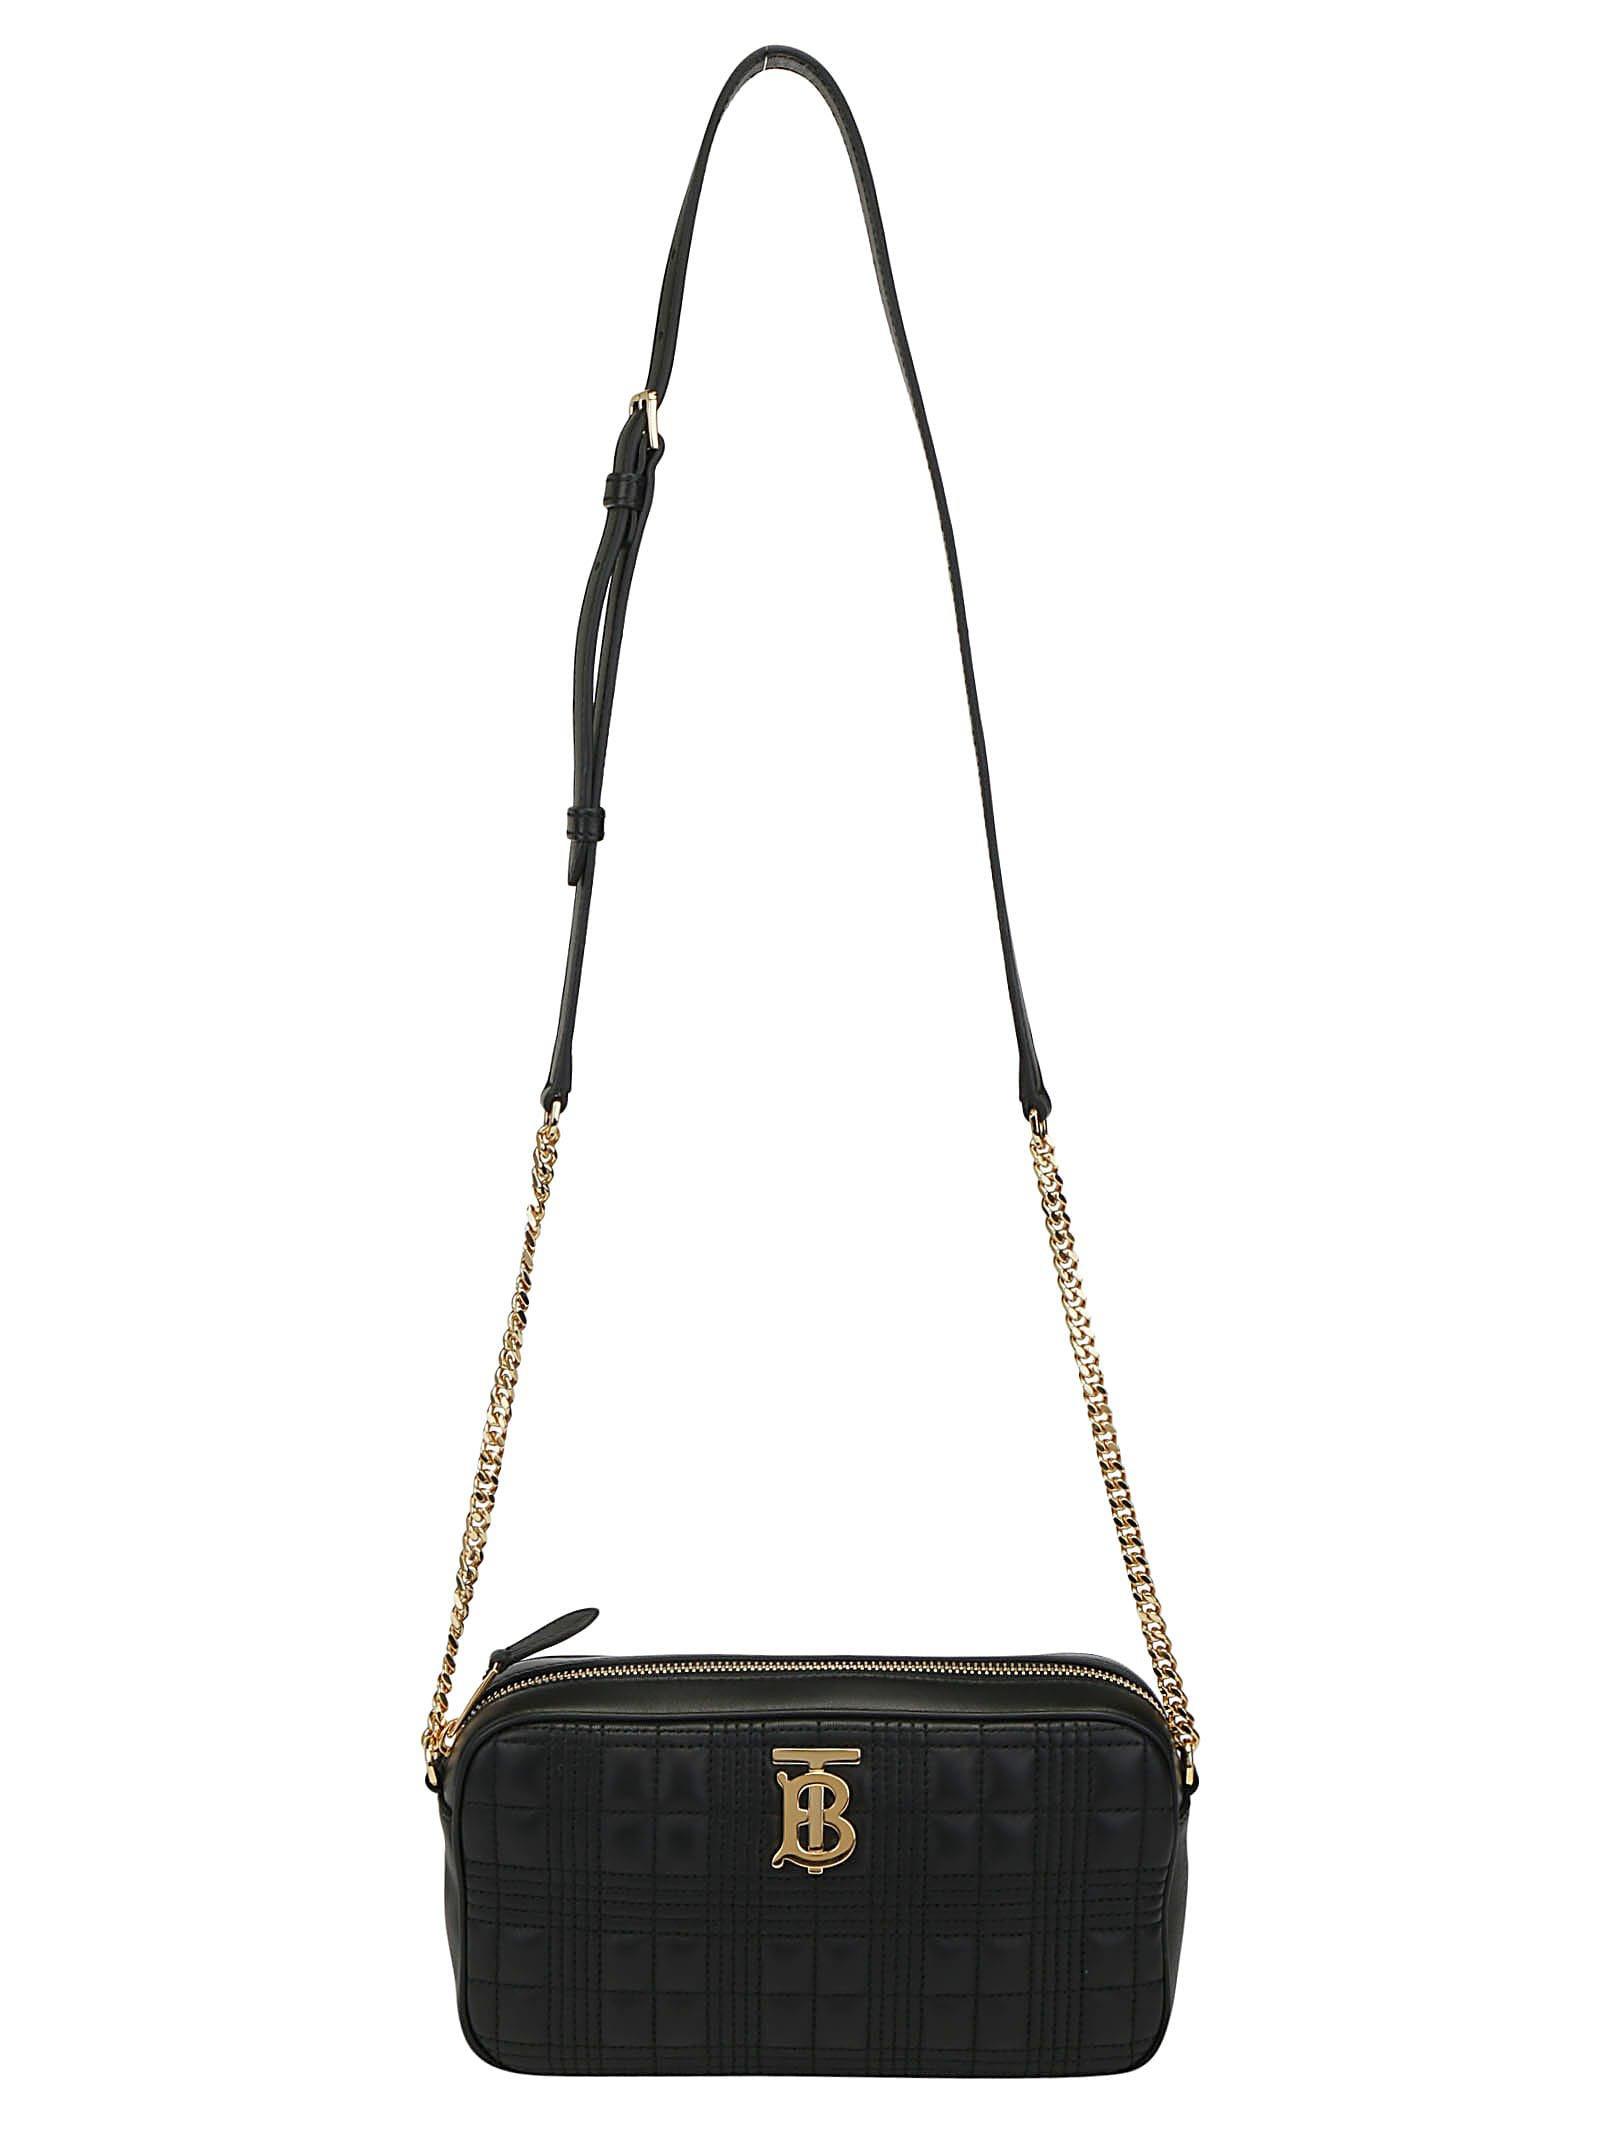 Burberry Lambskin Camera Shoulder Bag